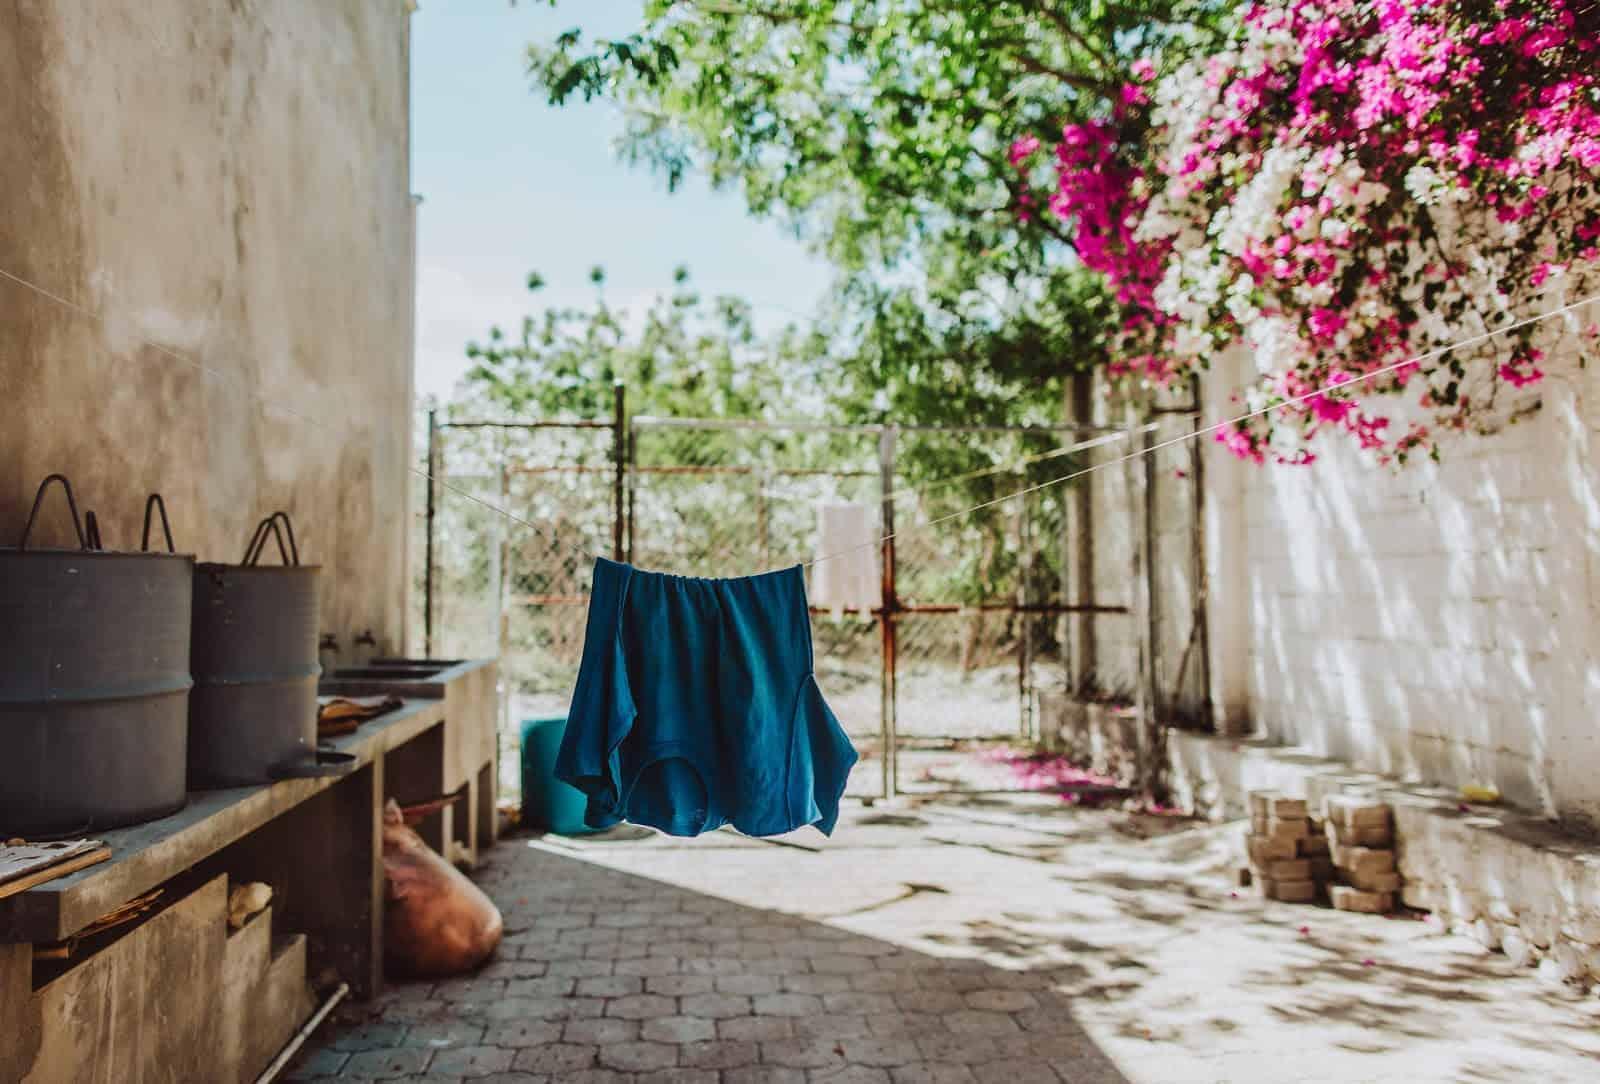 Beautiful scene in Haiti